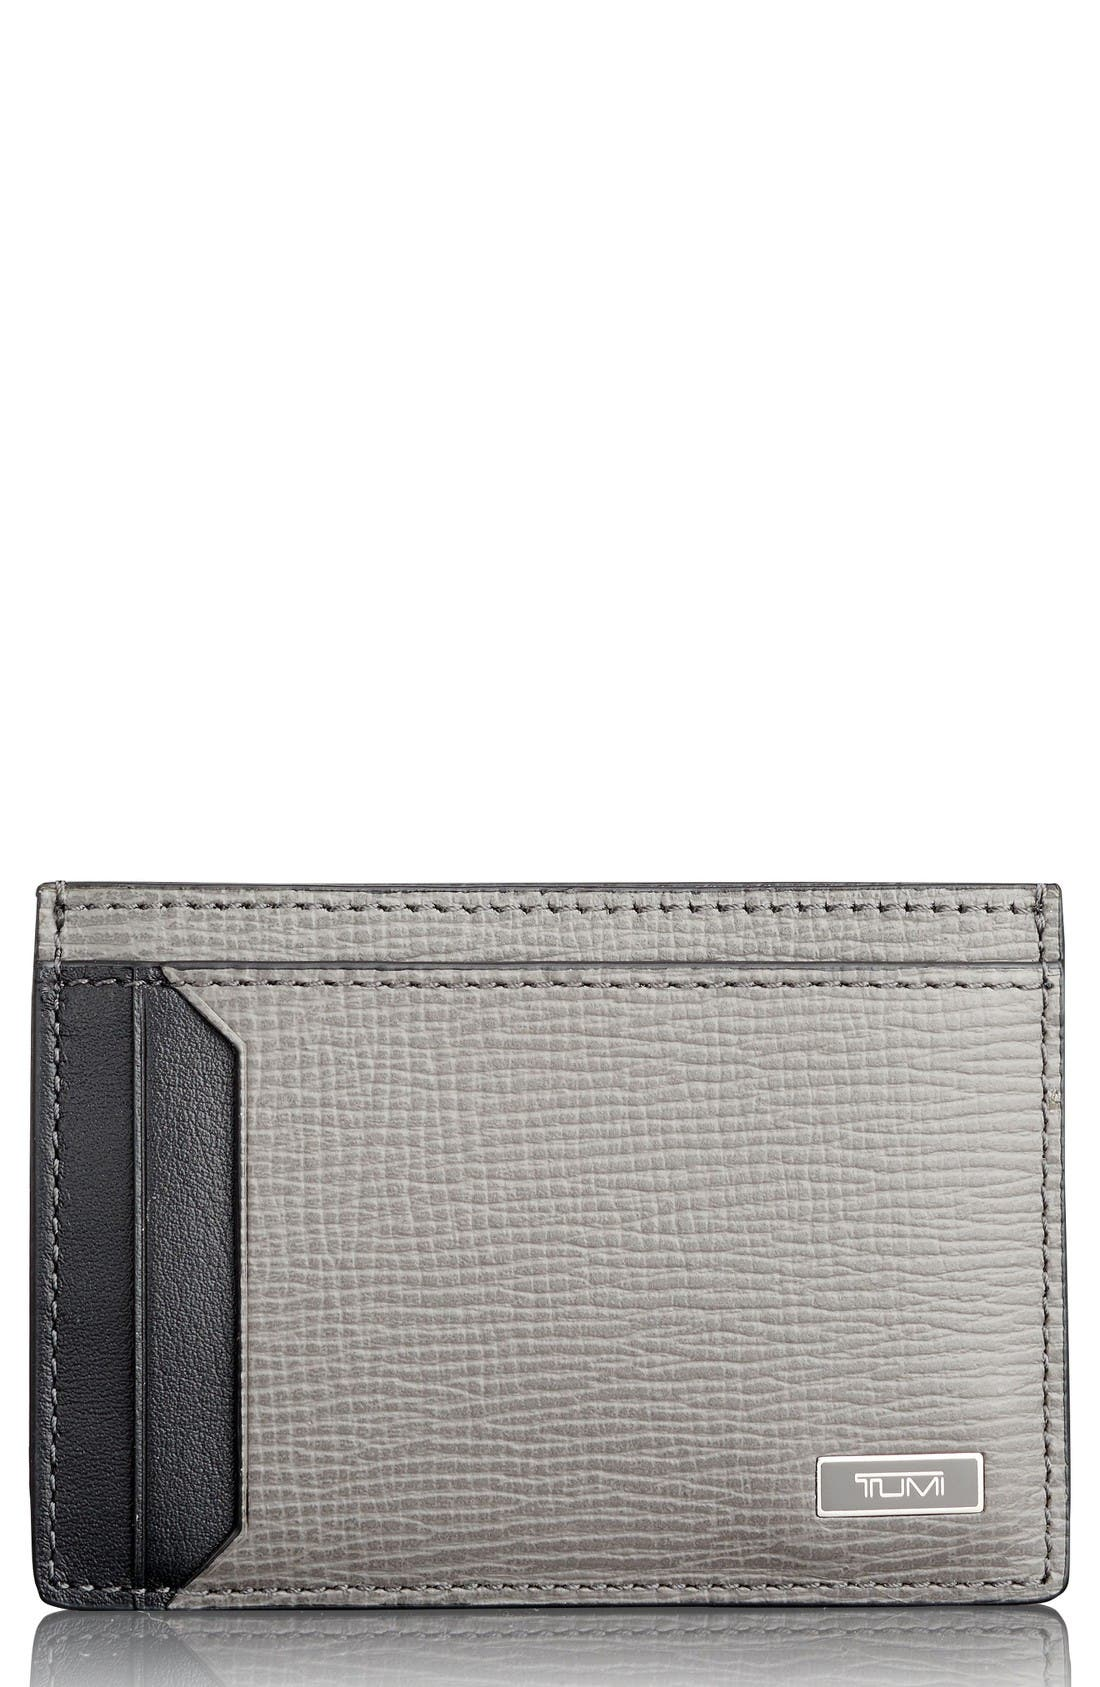 Monaco Leather RFID Money Clip Card Case,                         Main,                         color, Grey